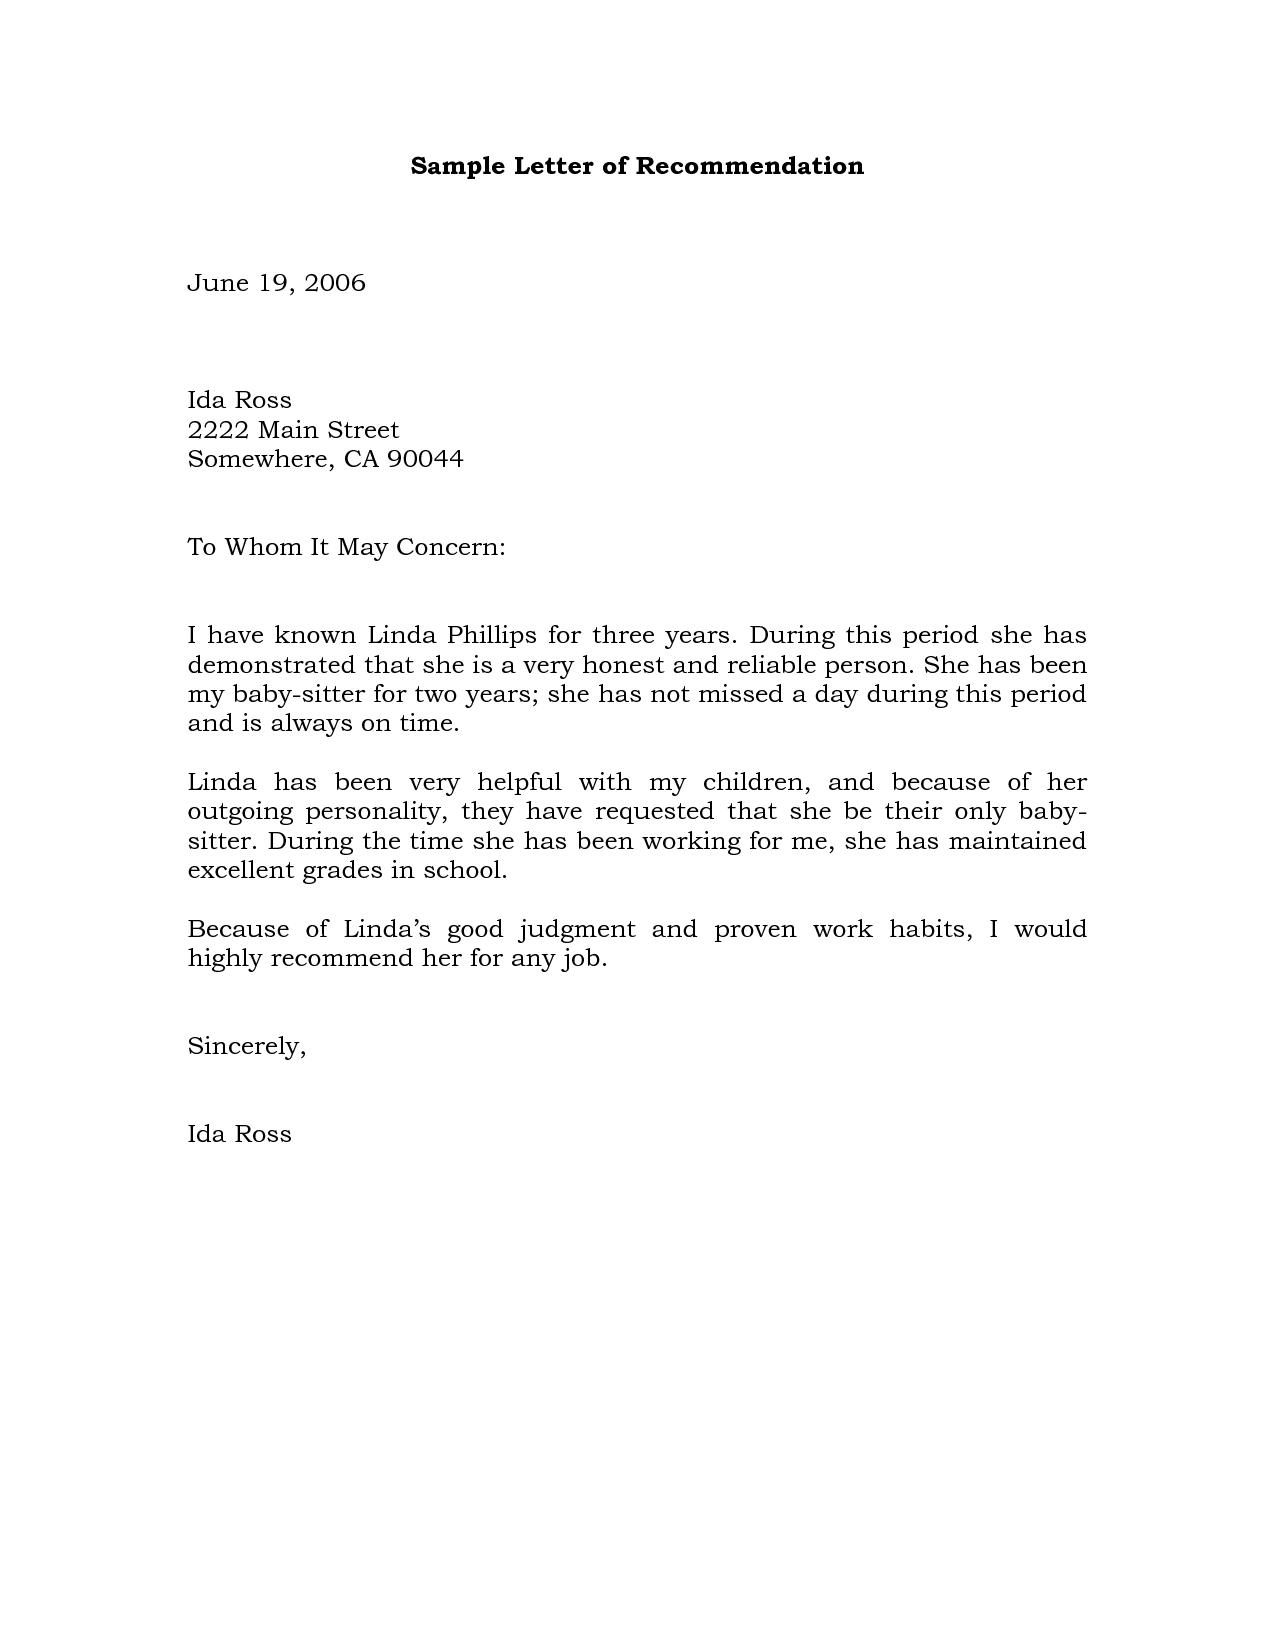 recommendation letter sample for nurse employee customer service recommendation letter sample for nurse employee sample nursing letter of recommendation letter sample letter sample referral